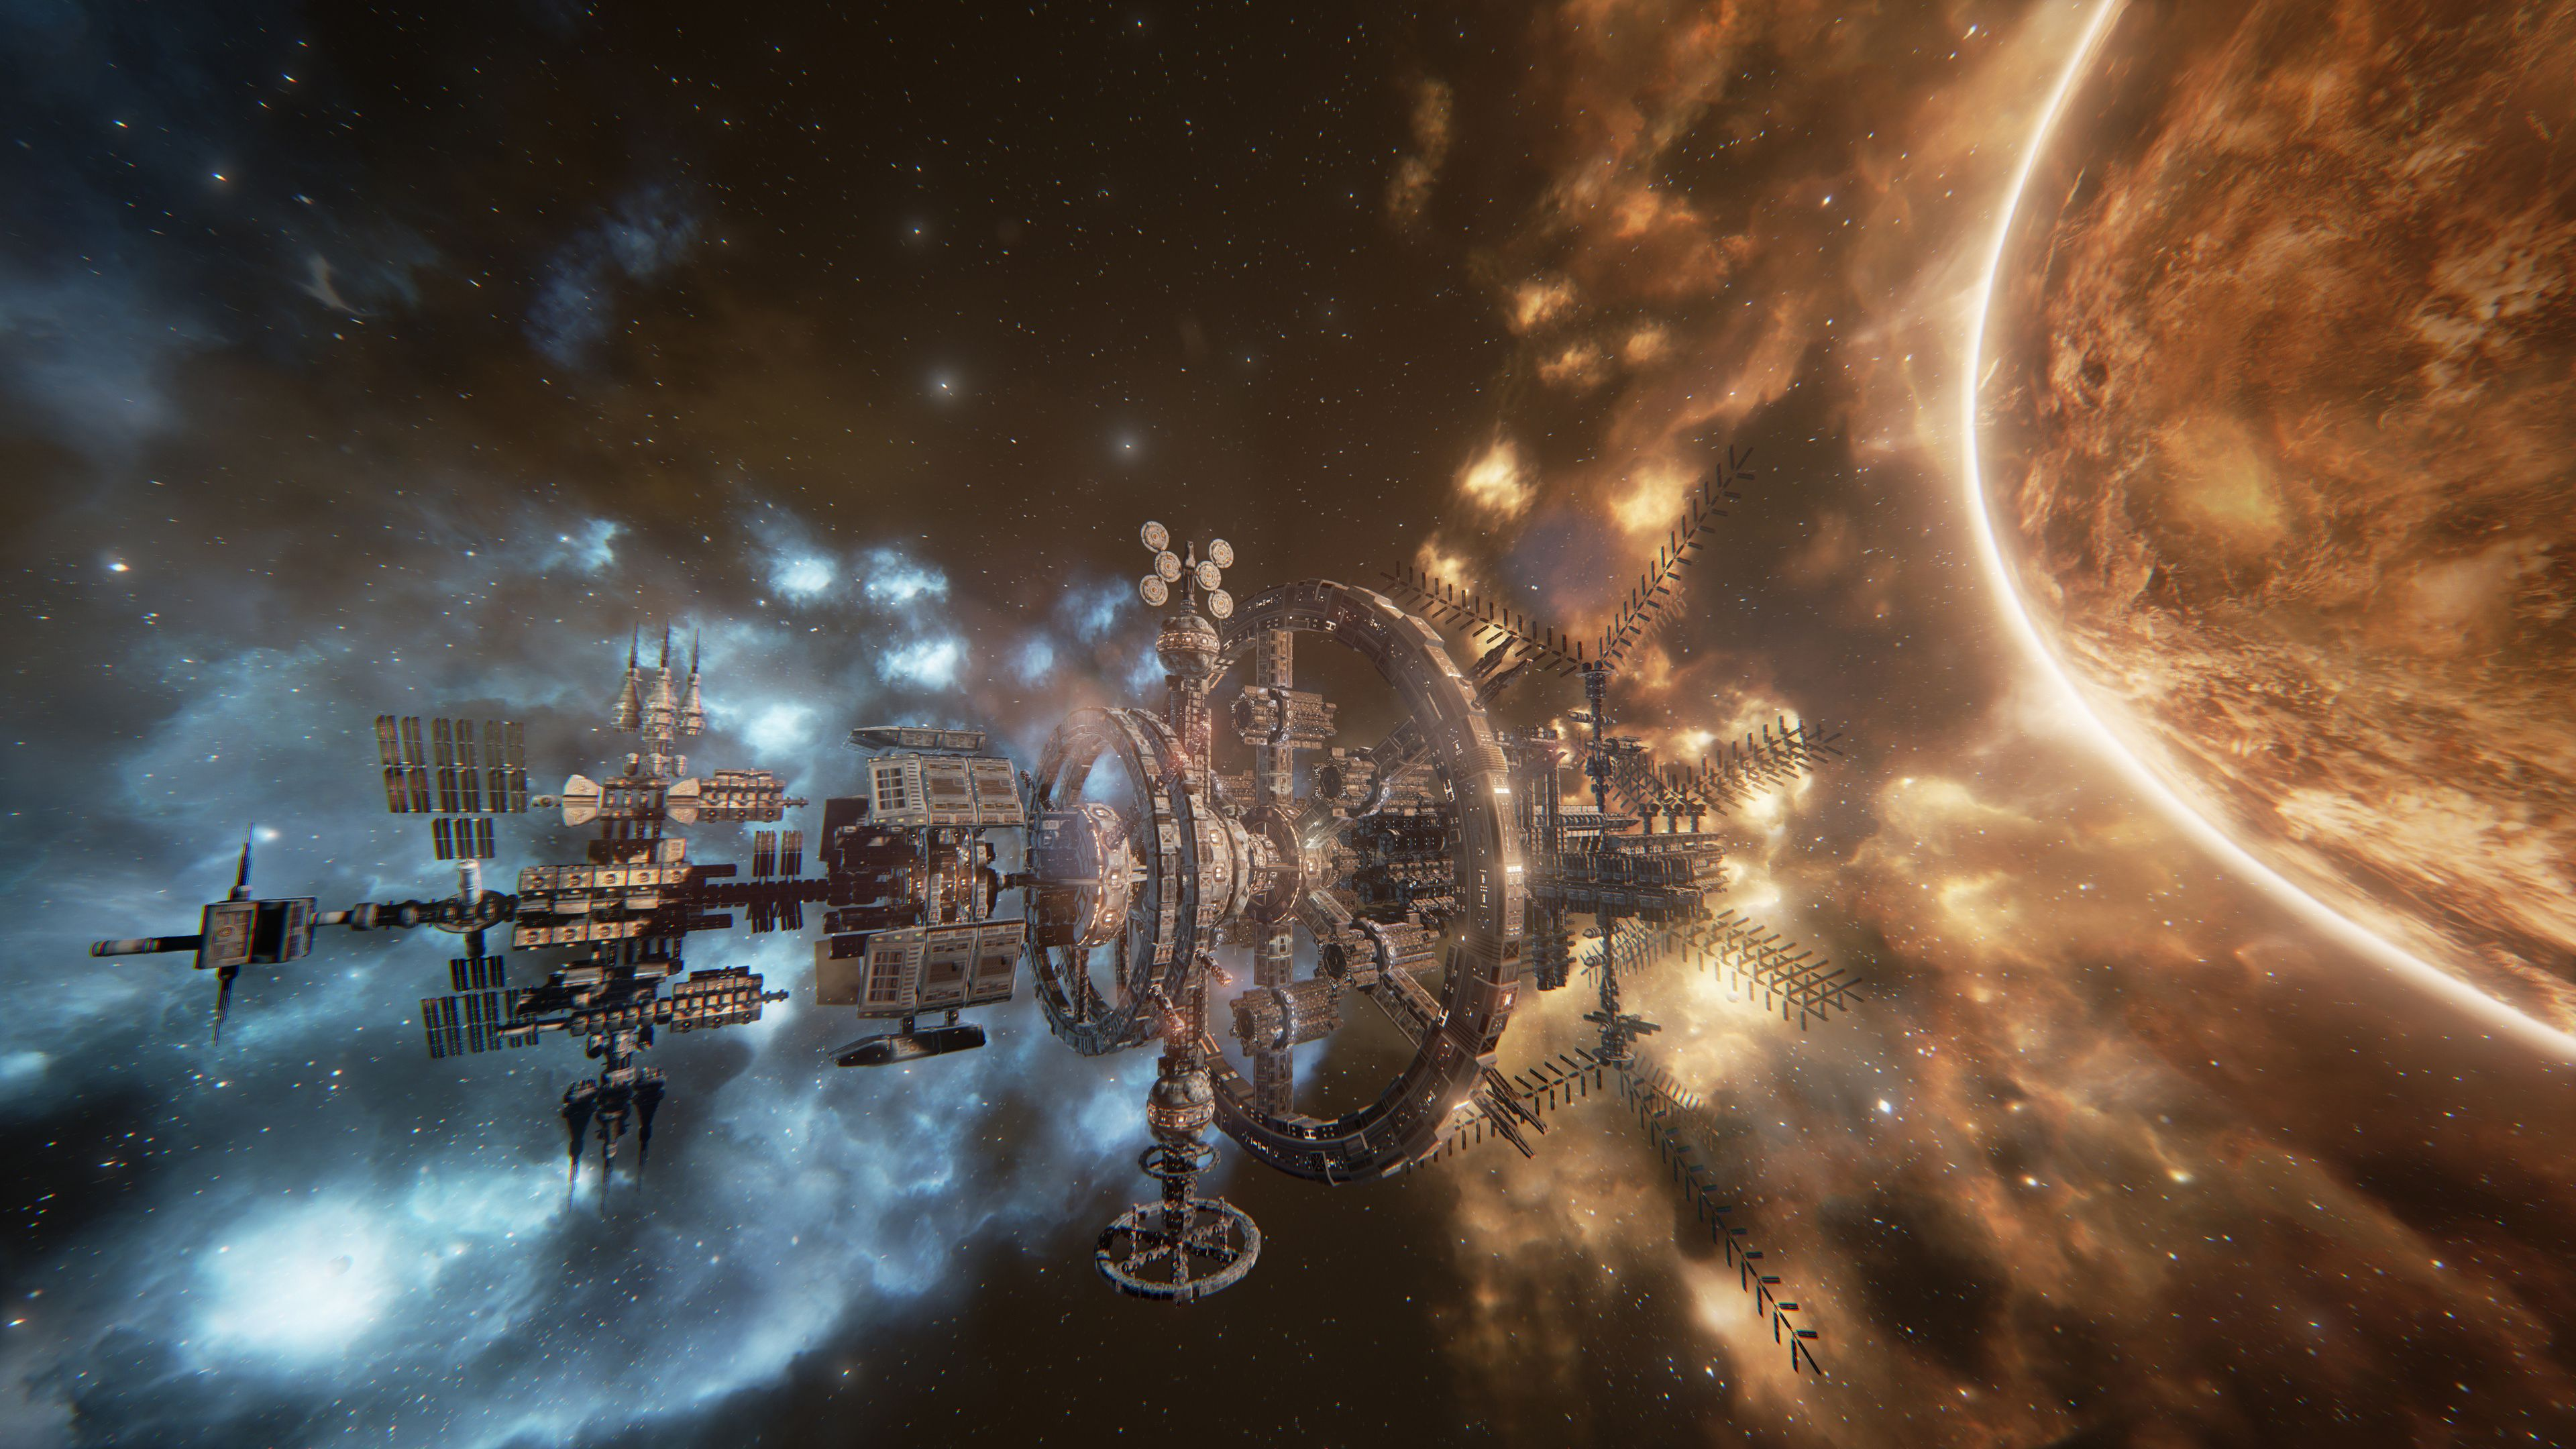 Sci Fi 4k Wallpapers Top Free Sci Fi 4k Backgrounds